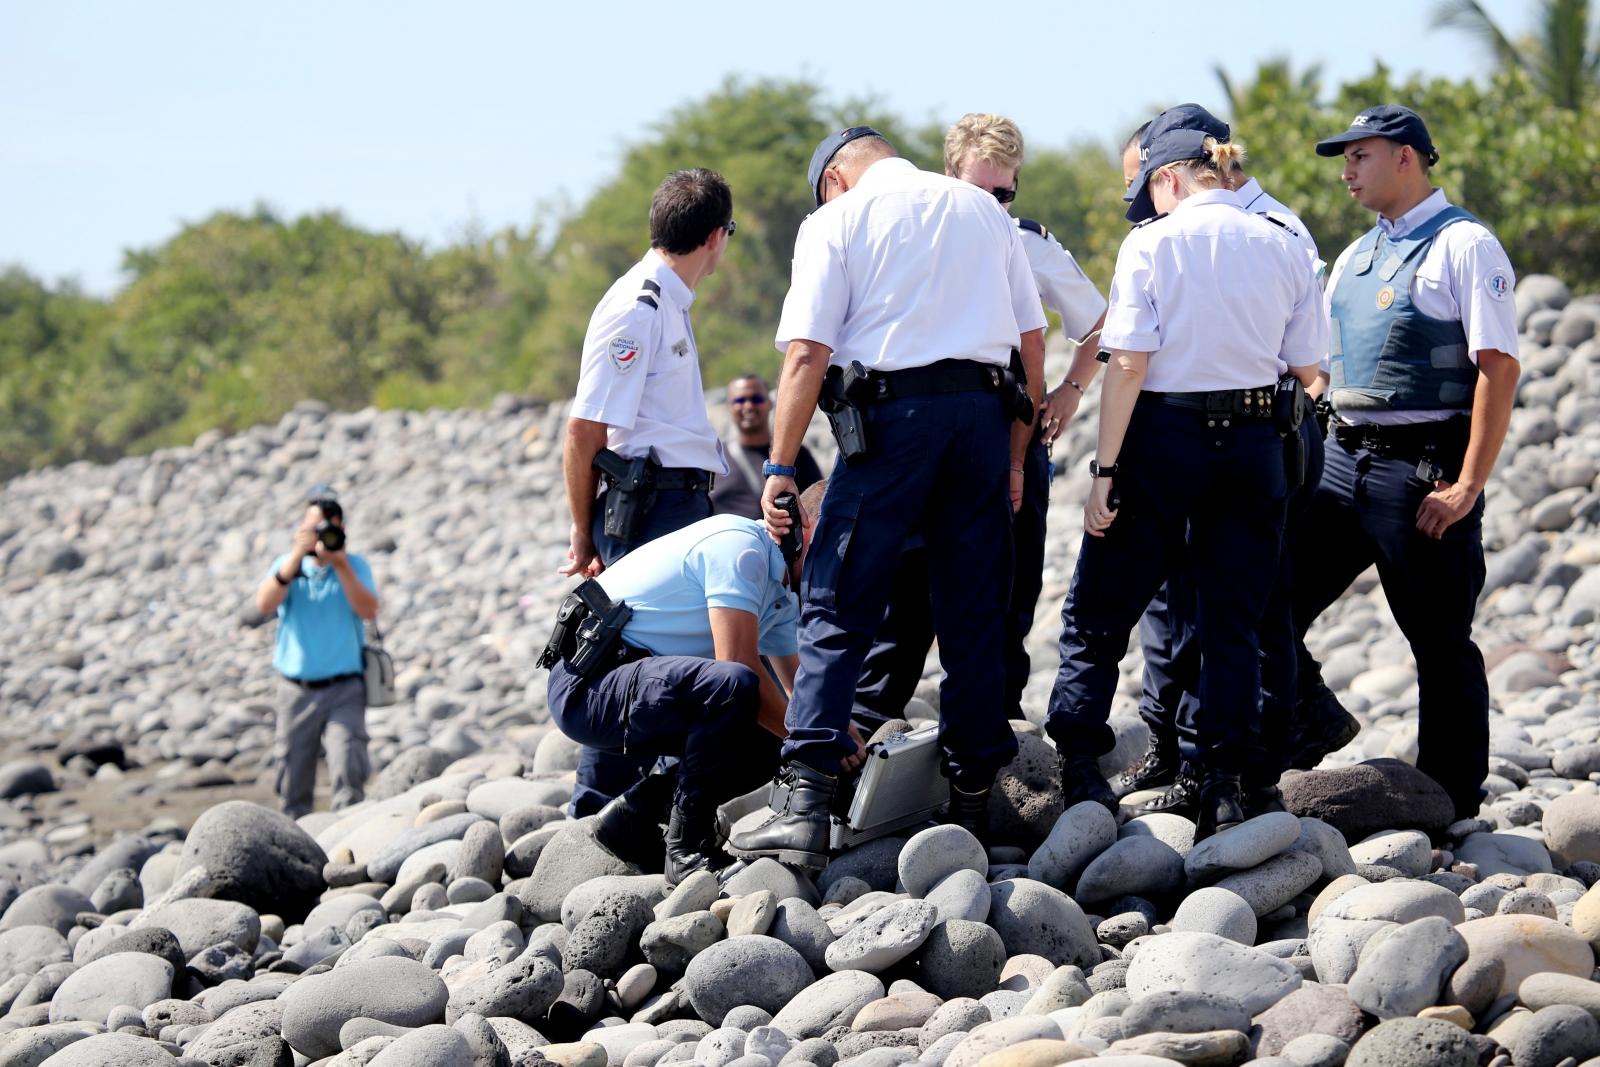 Police search for Flight 370 debris